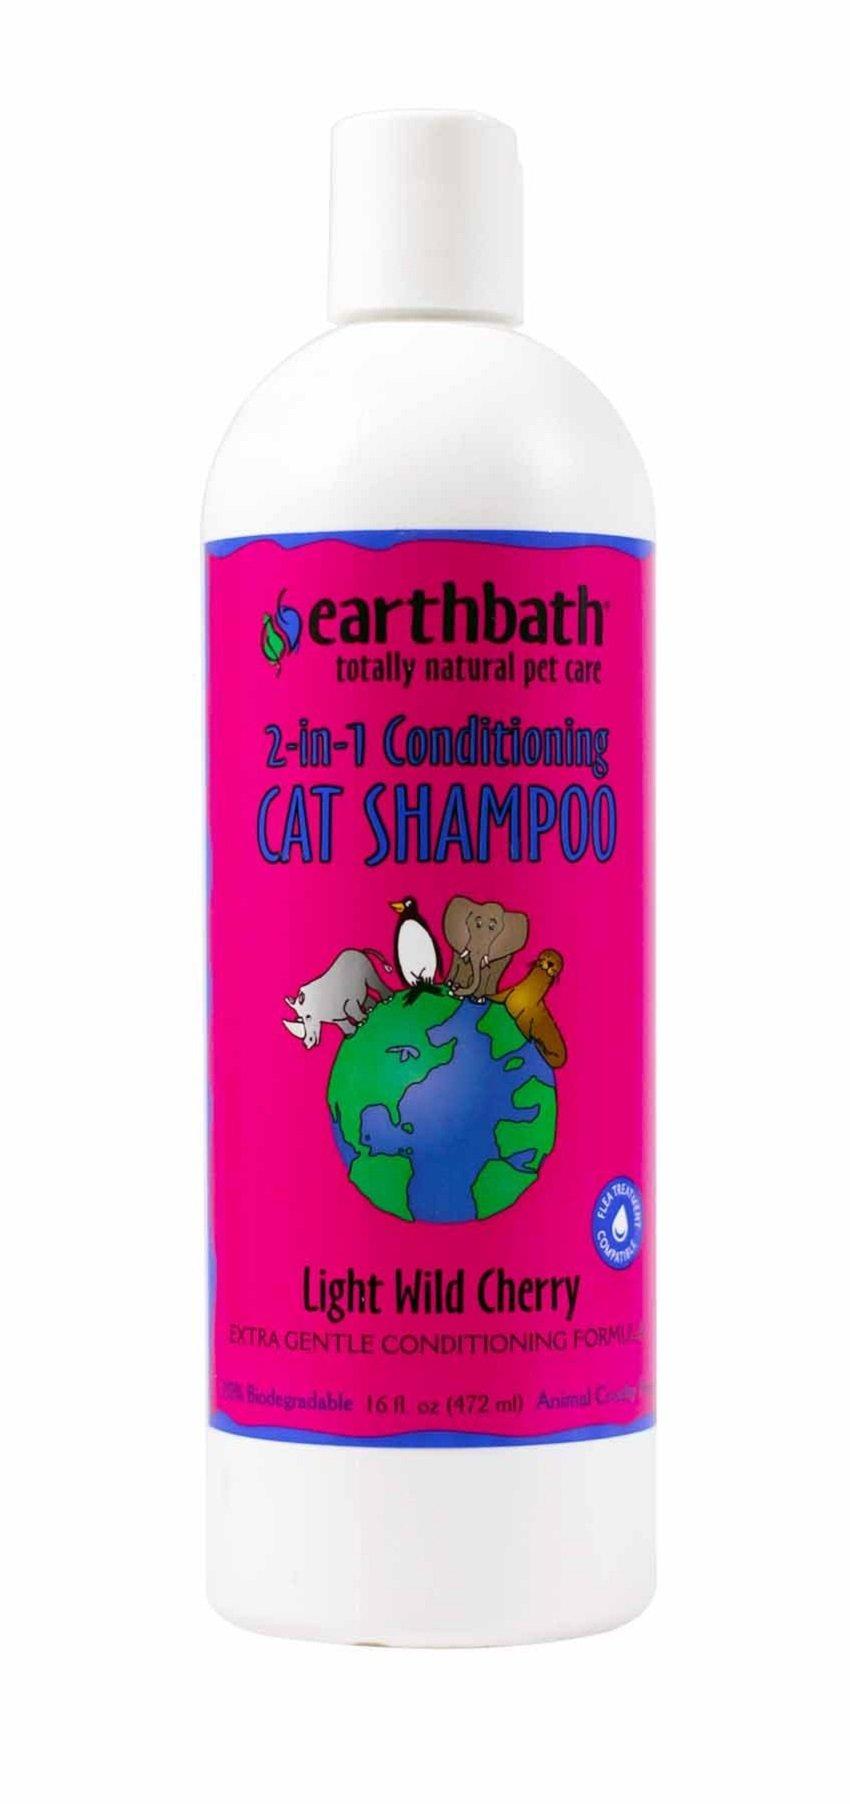 Earthbath Cat Shampoo Reviews